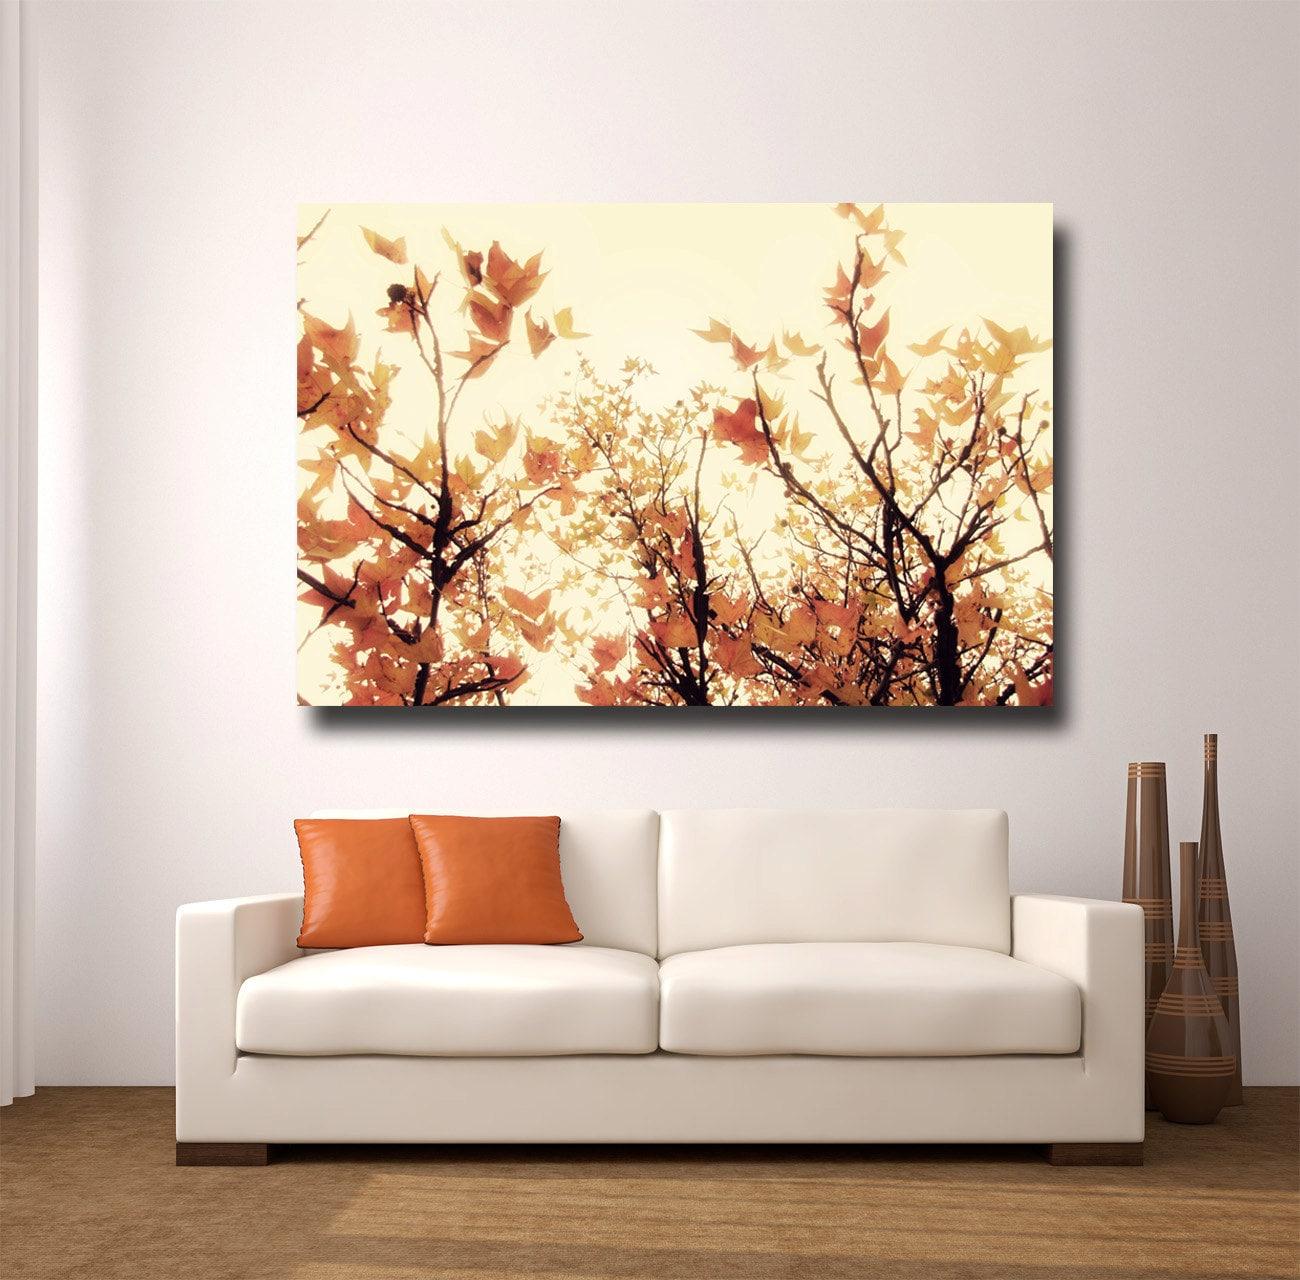 Large Orange Wall Art Canvas Gallery Wrap By Amytylerphotography